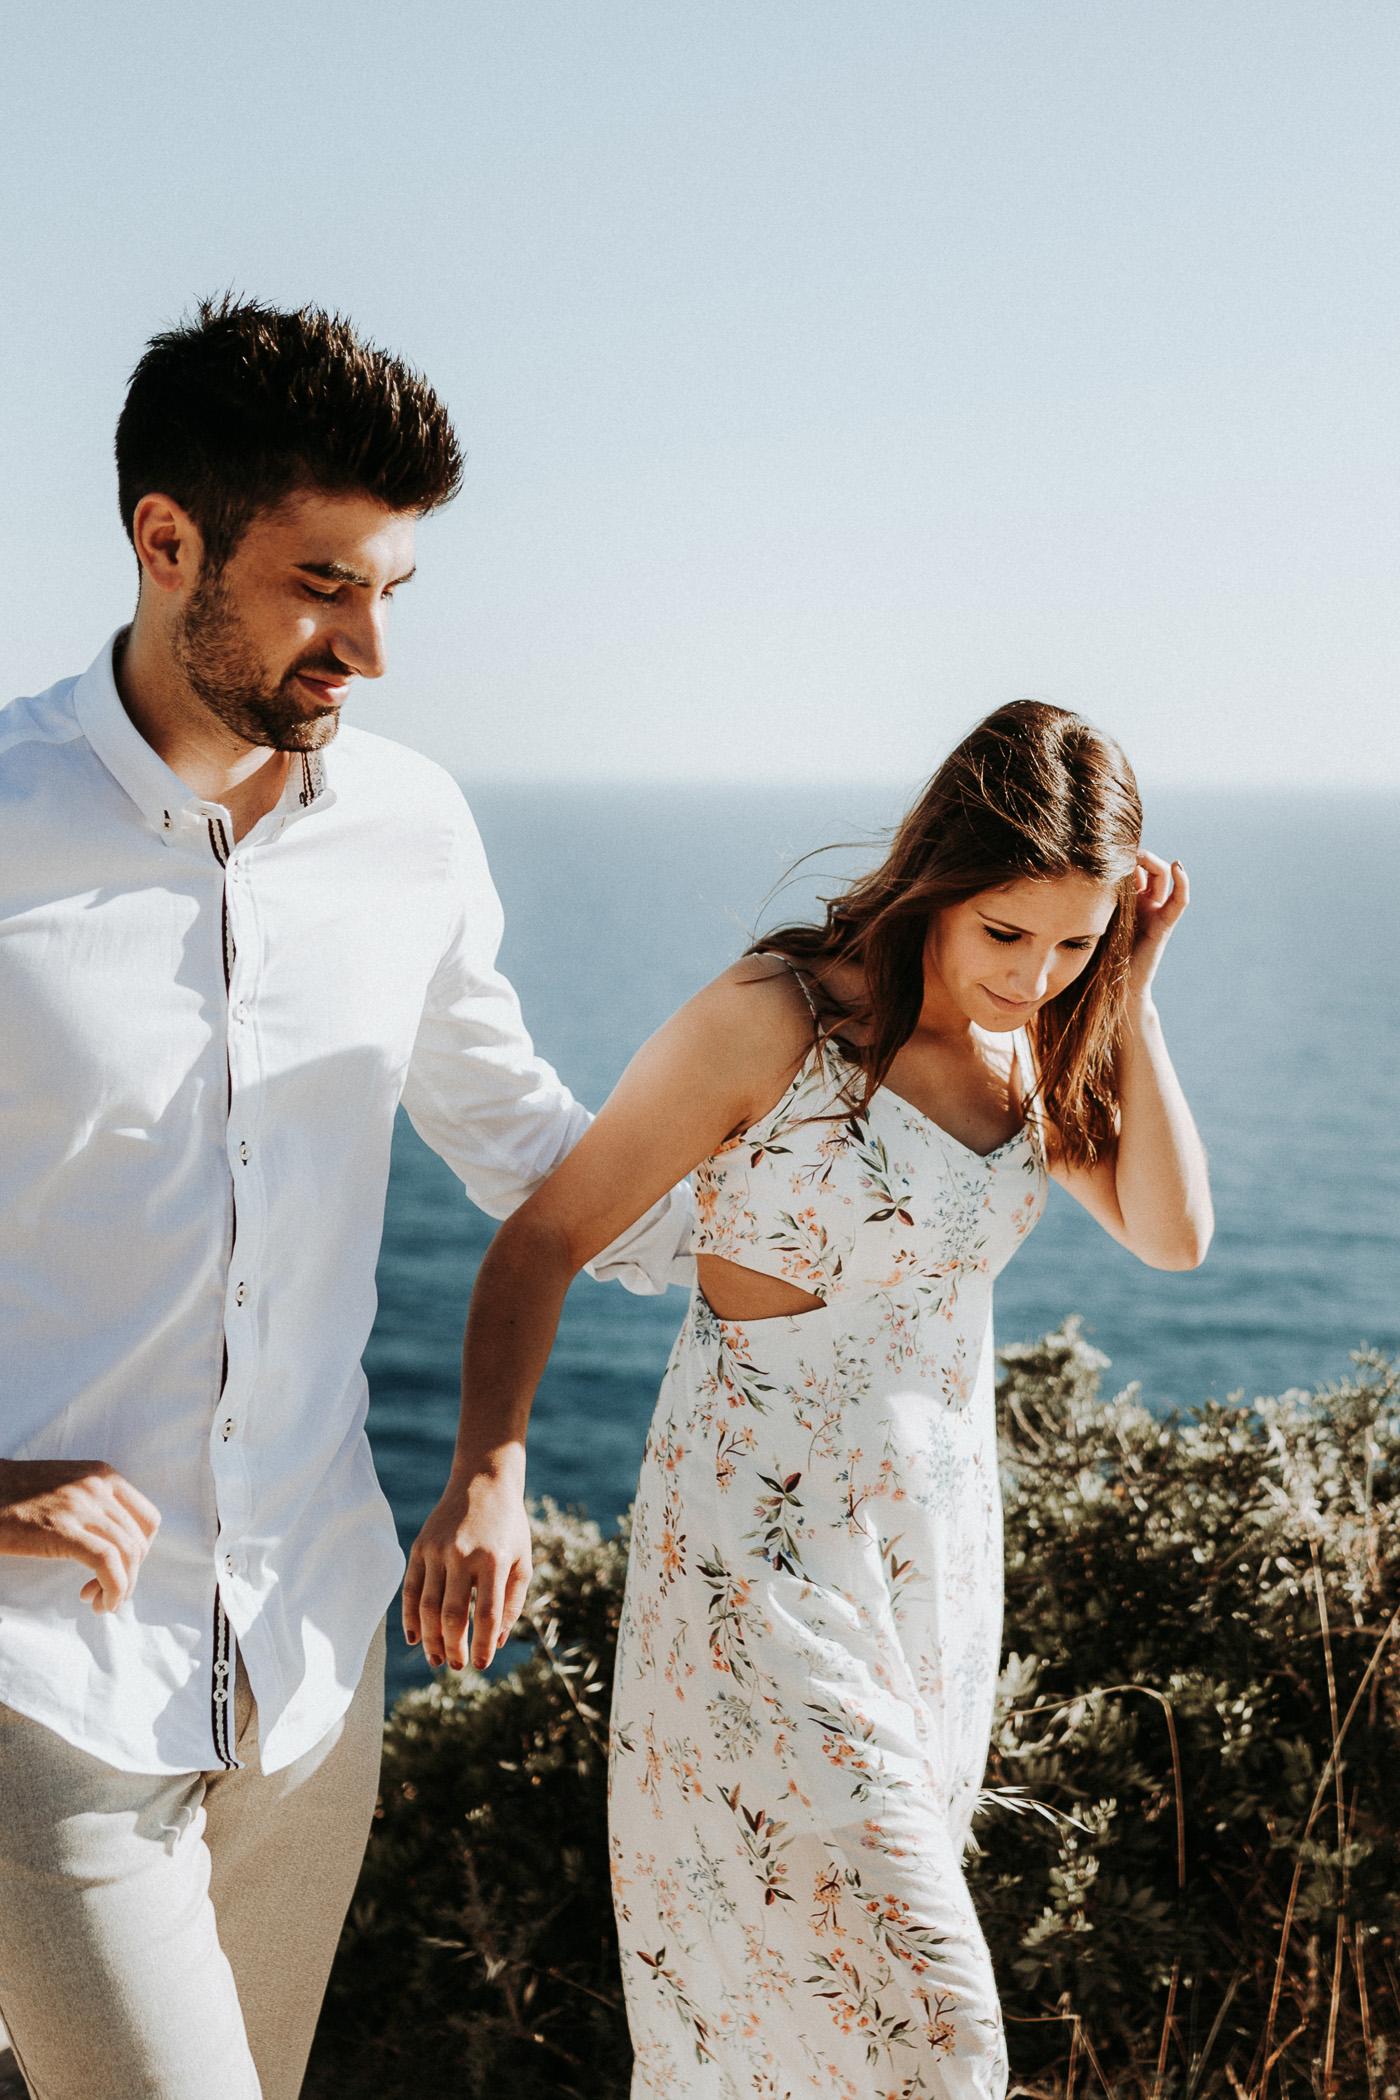 DanielaMarquardtPhotography_wedding_elopement_mallorca_spain_calapi_palma_lauraandtoni_29